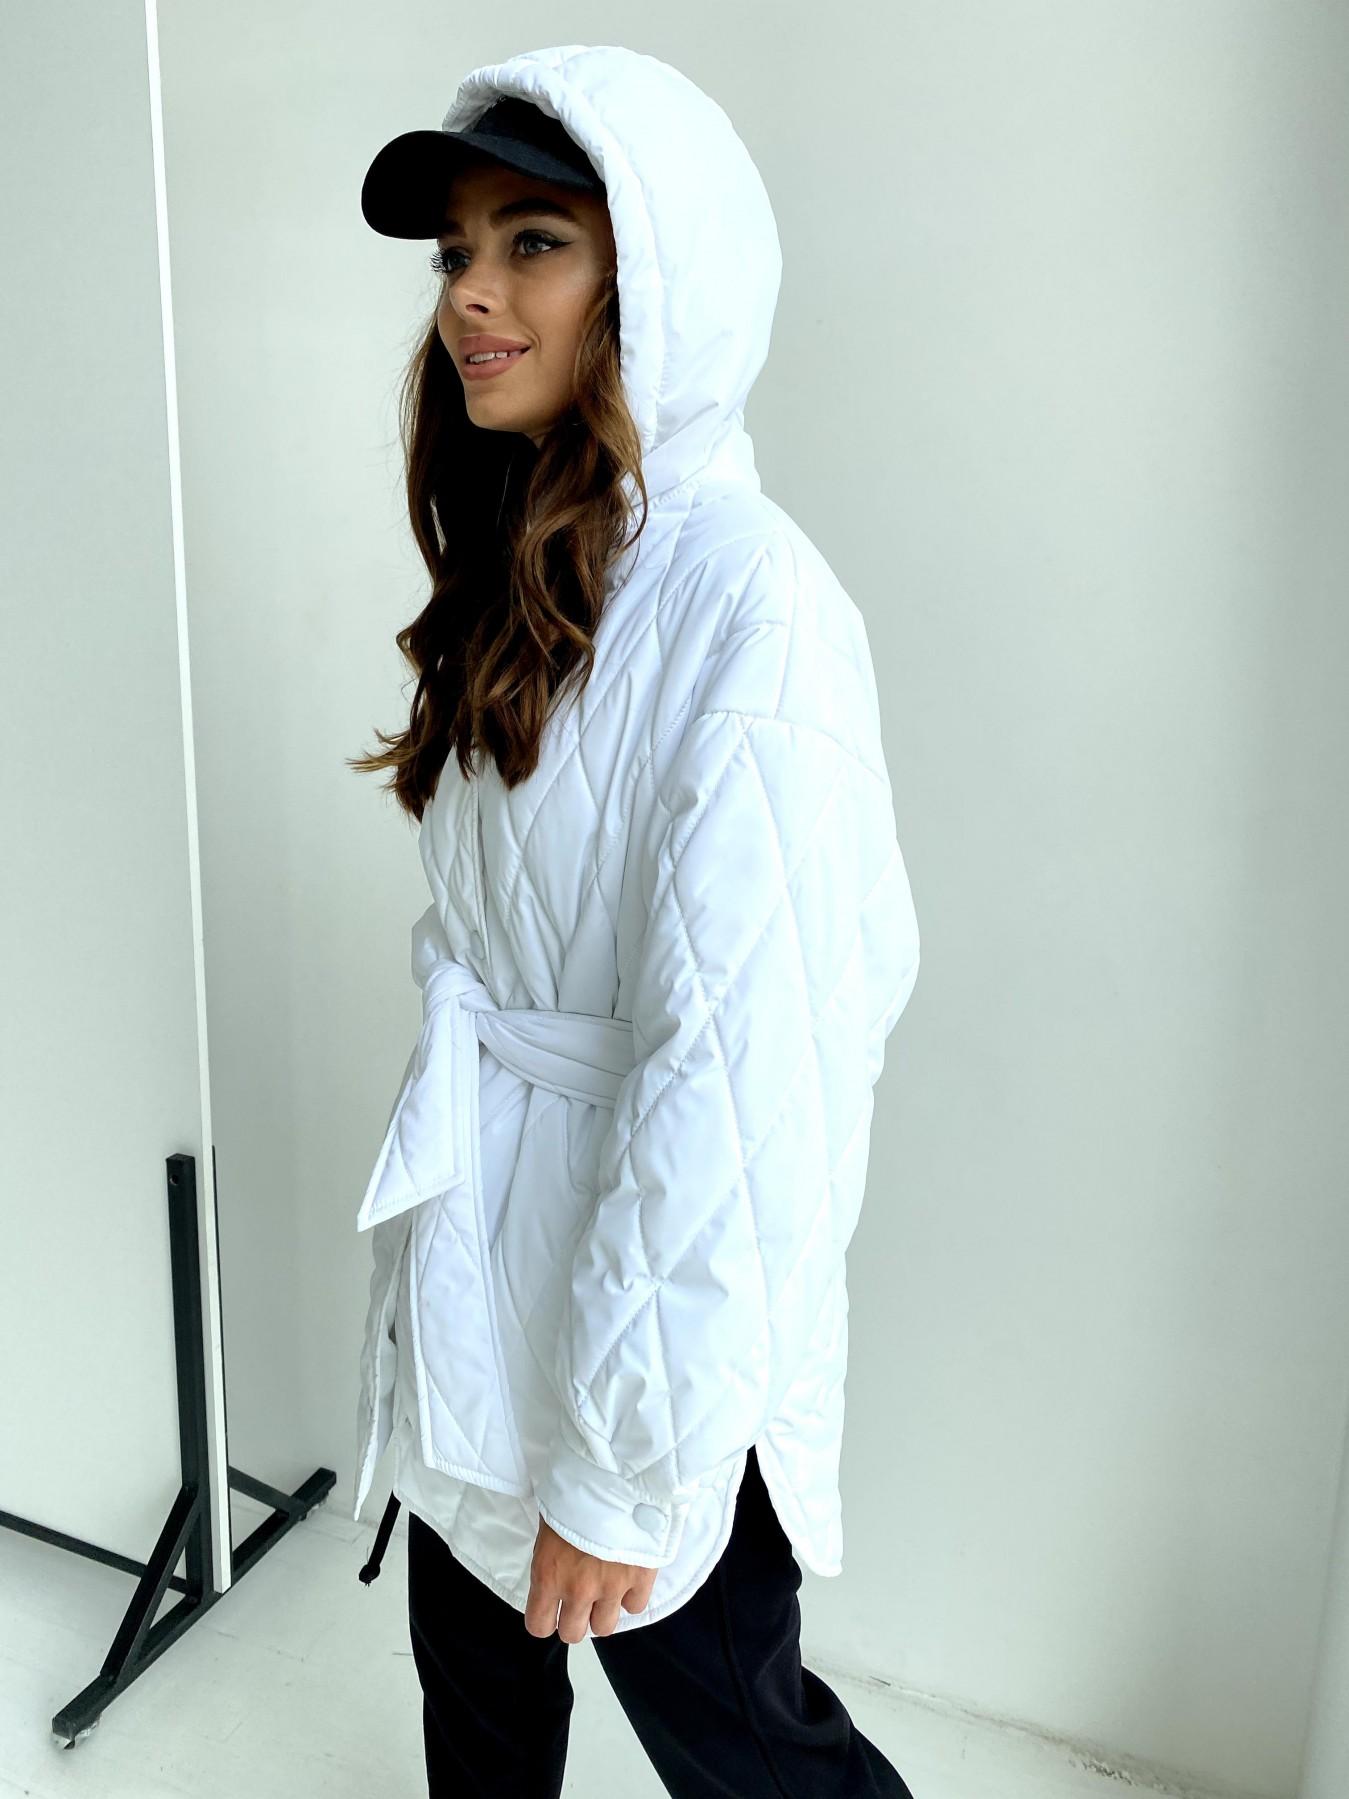 Пазл стеганая куртка из плащевки 11764 АРТ. 48509 Цвет: Молоко 12 - фото 2, интернет магазин tm-modus.ru